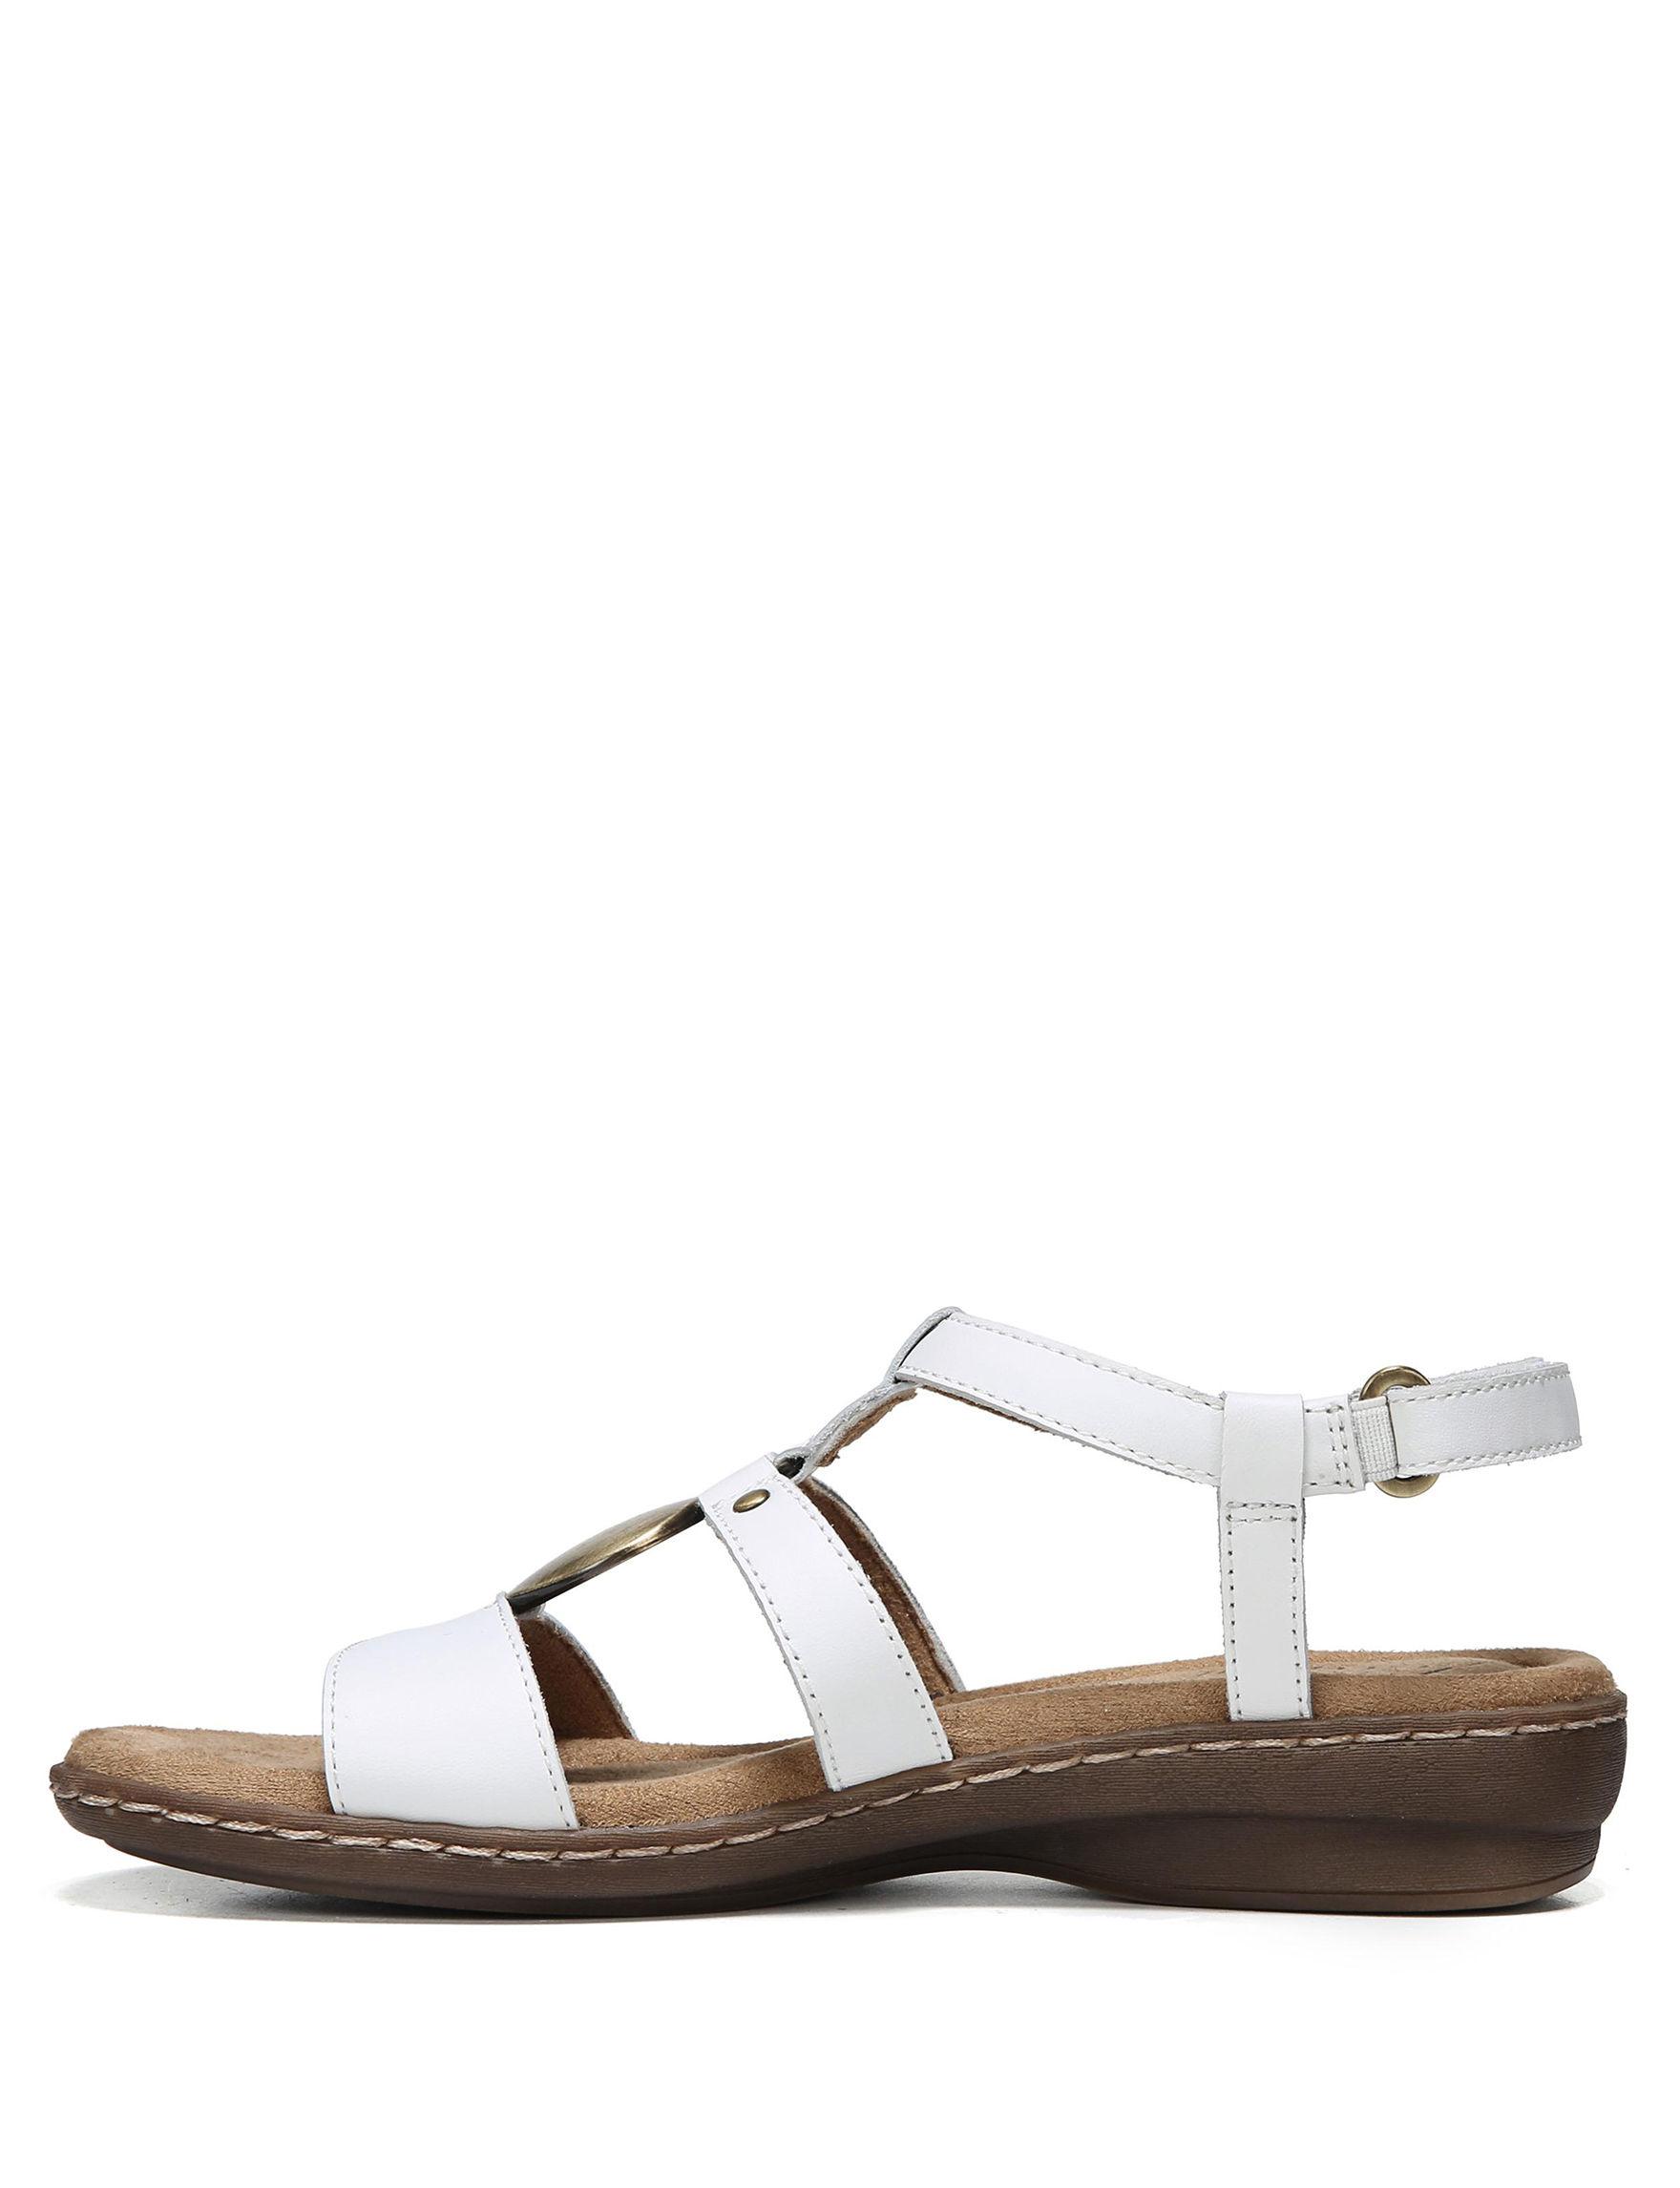 Natural Soul White Flat Sandals Footbed